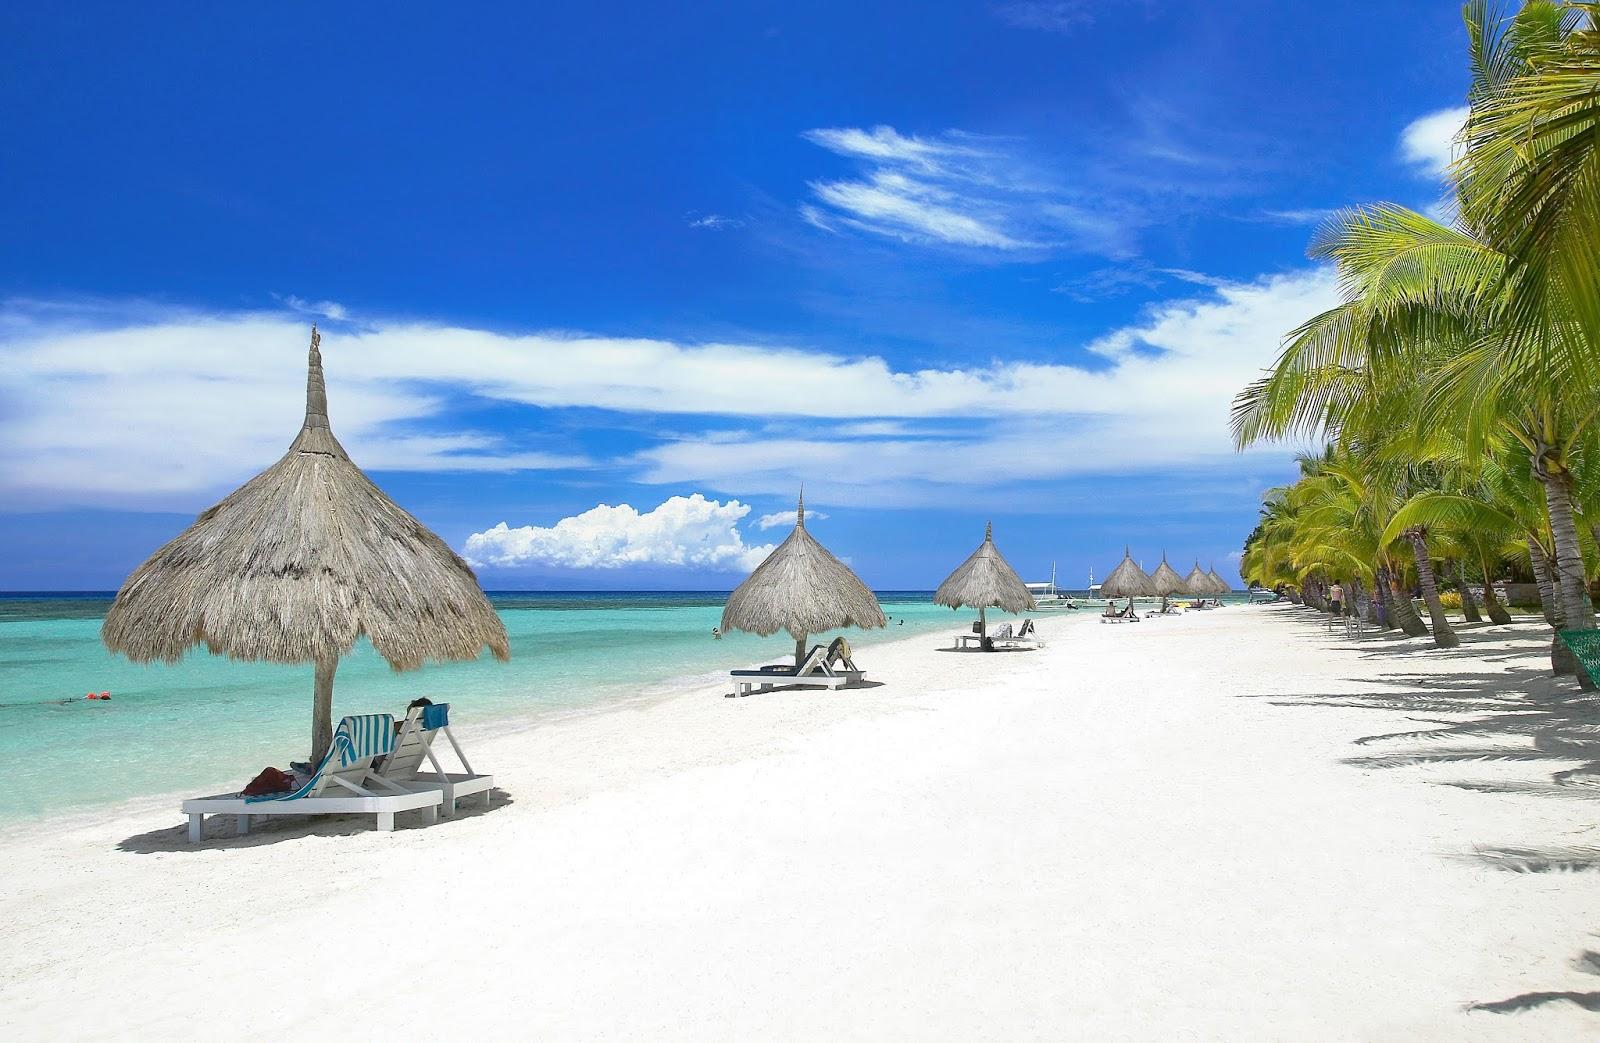 Bohol virgin island pictures Get